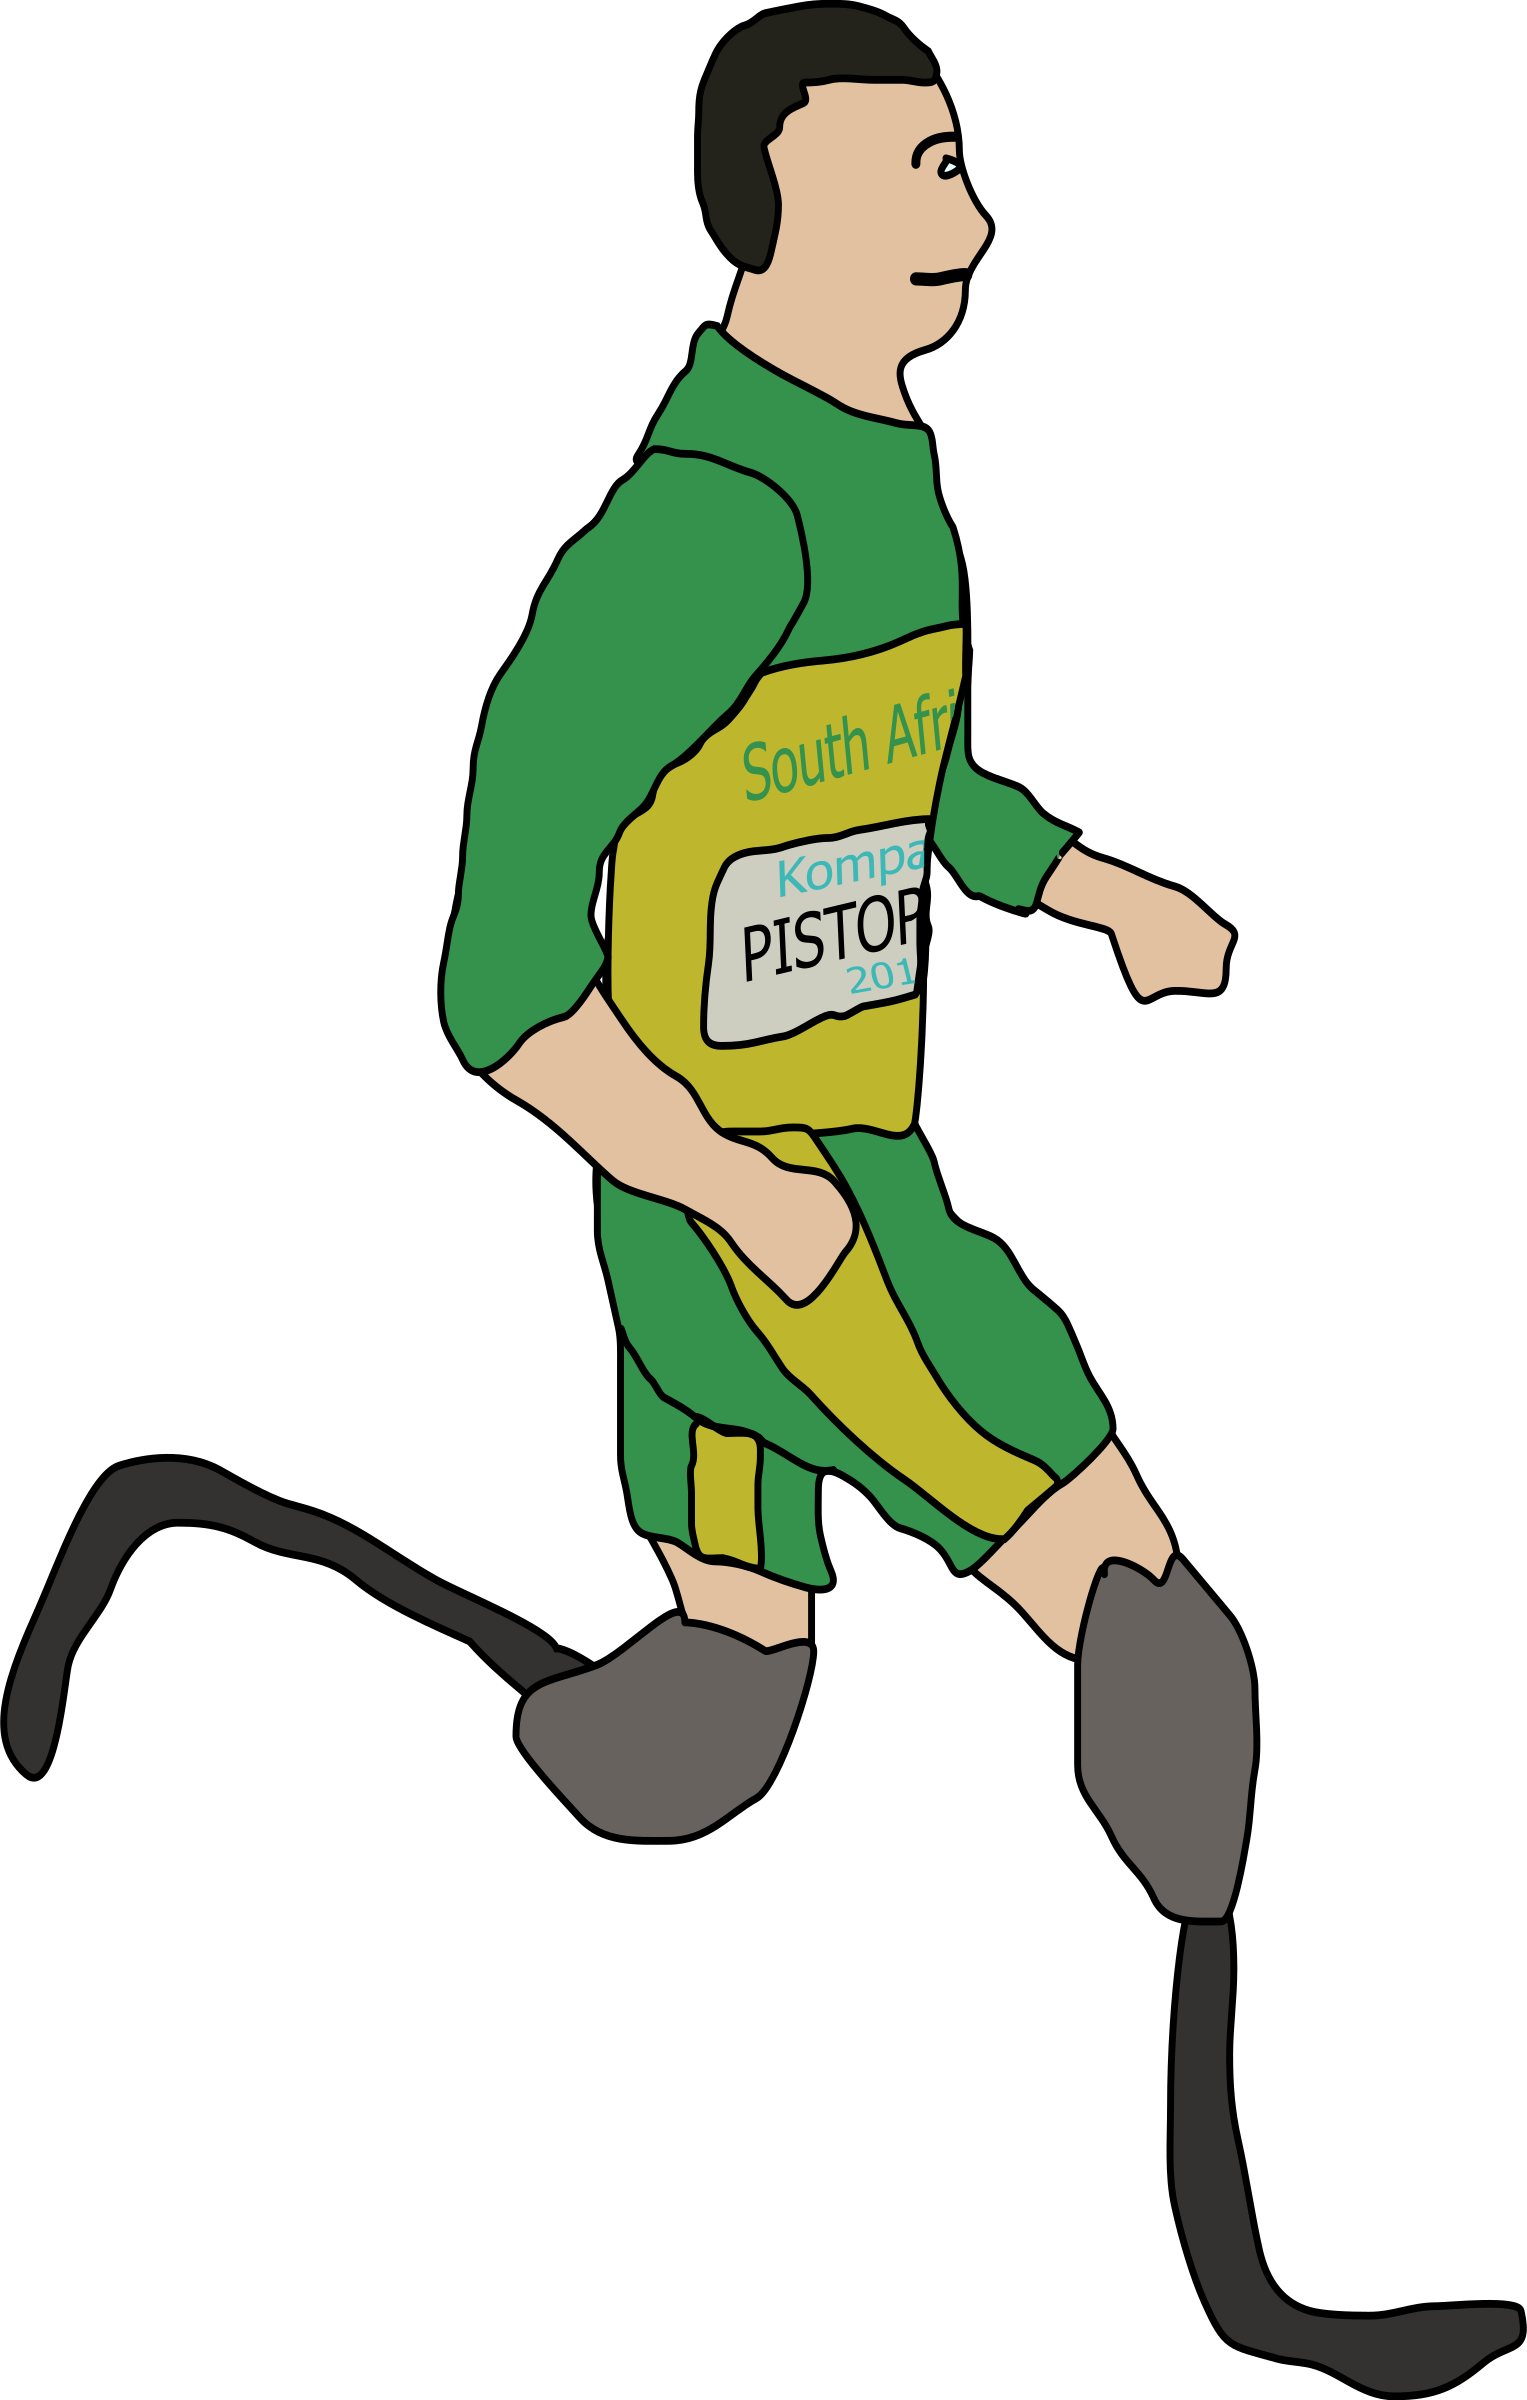 Runner clipart sprinter. Oscar pistorius amputee big